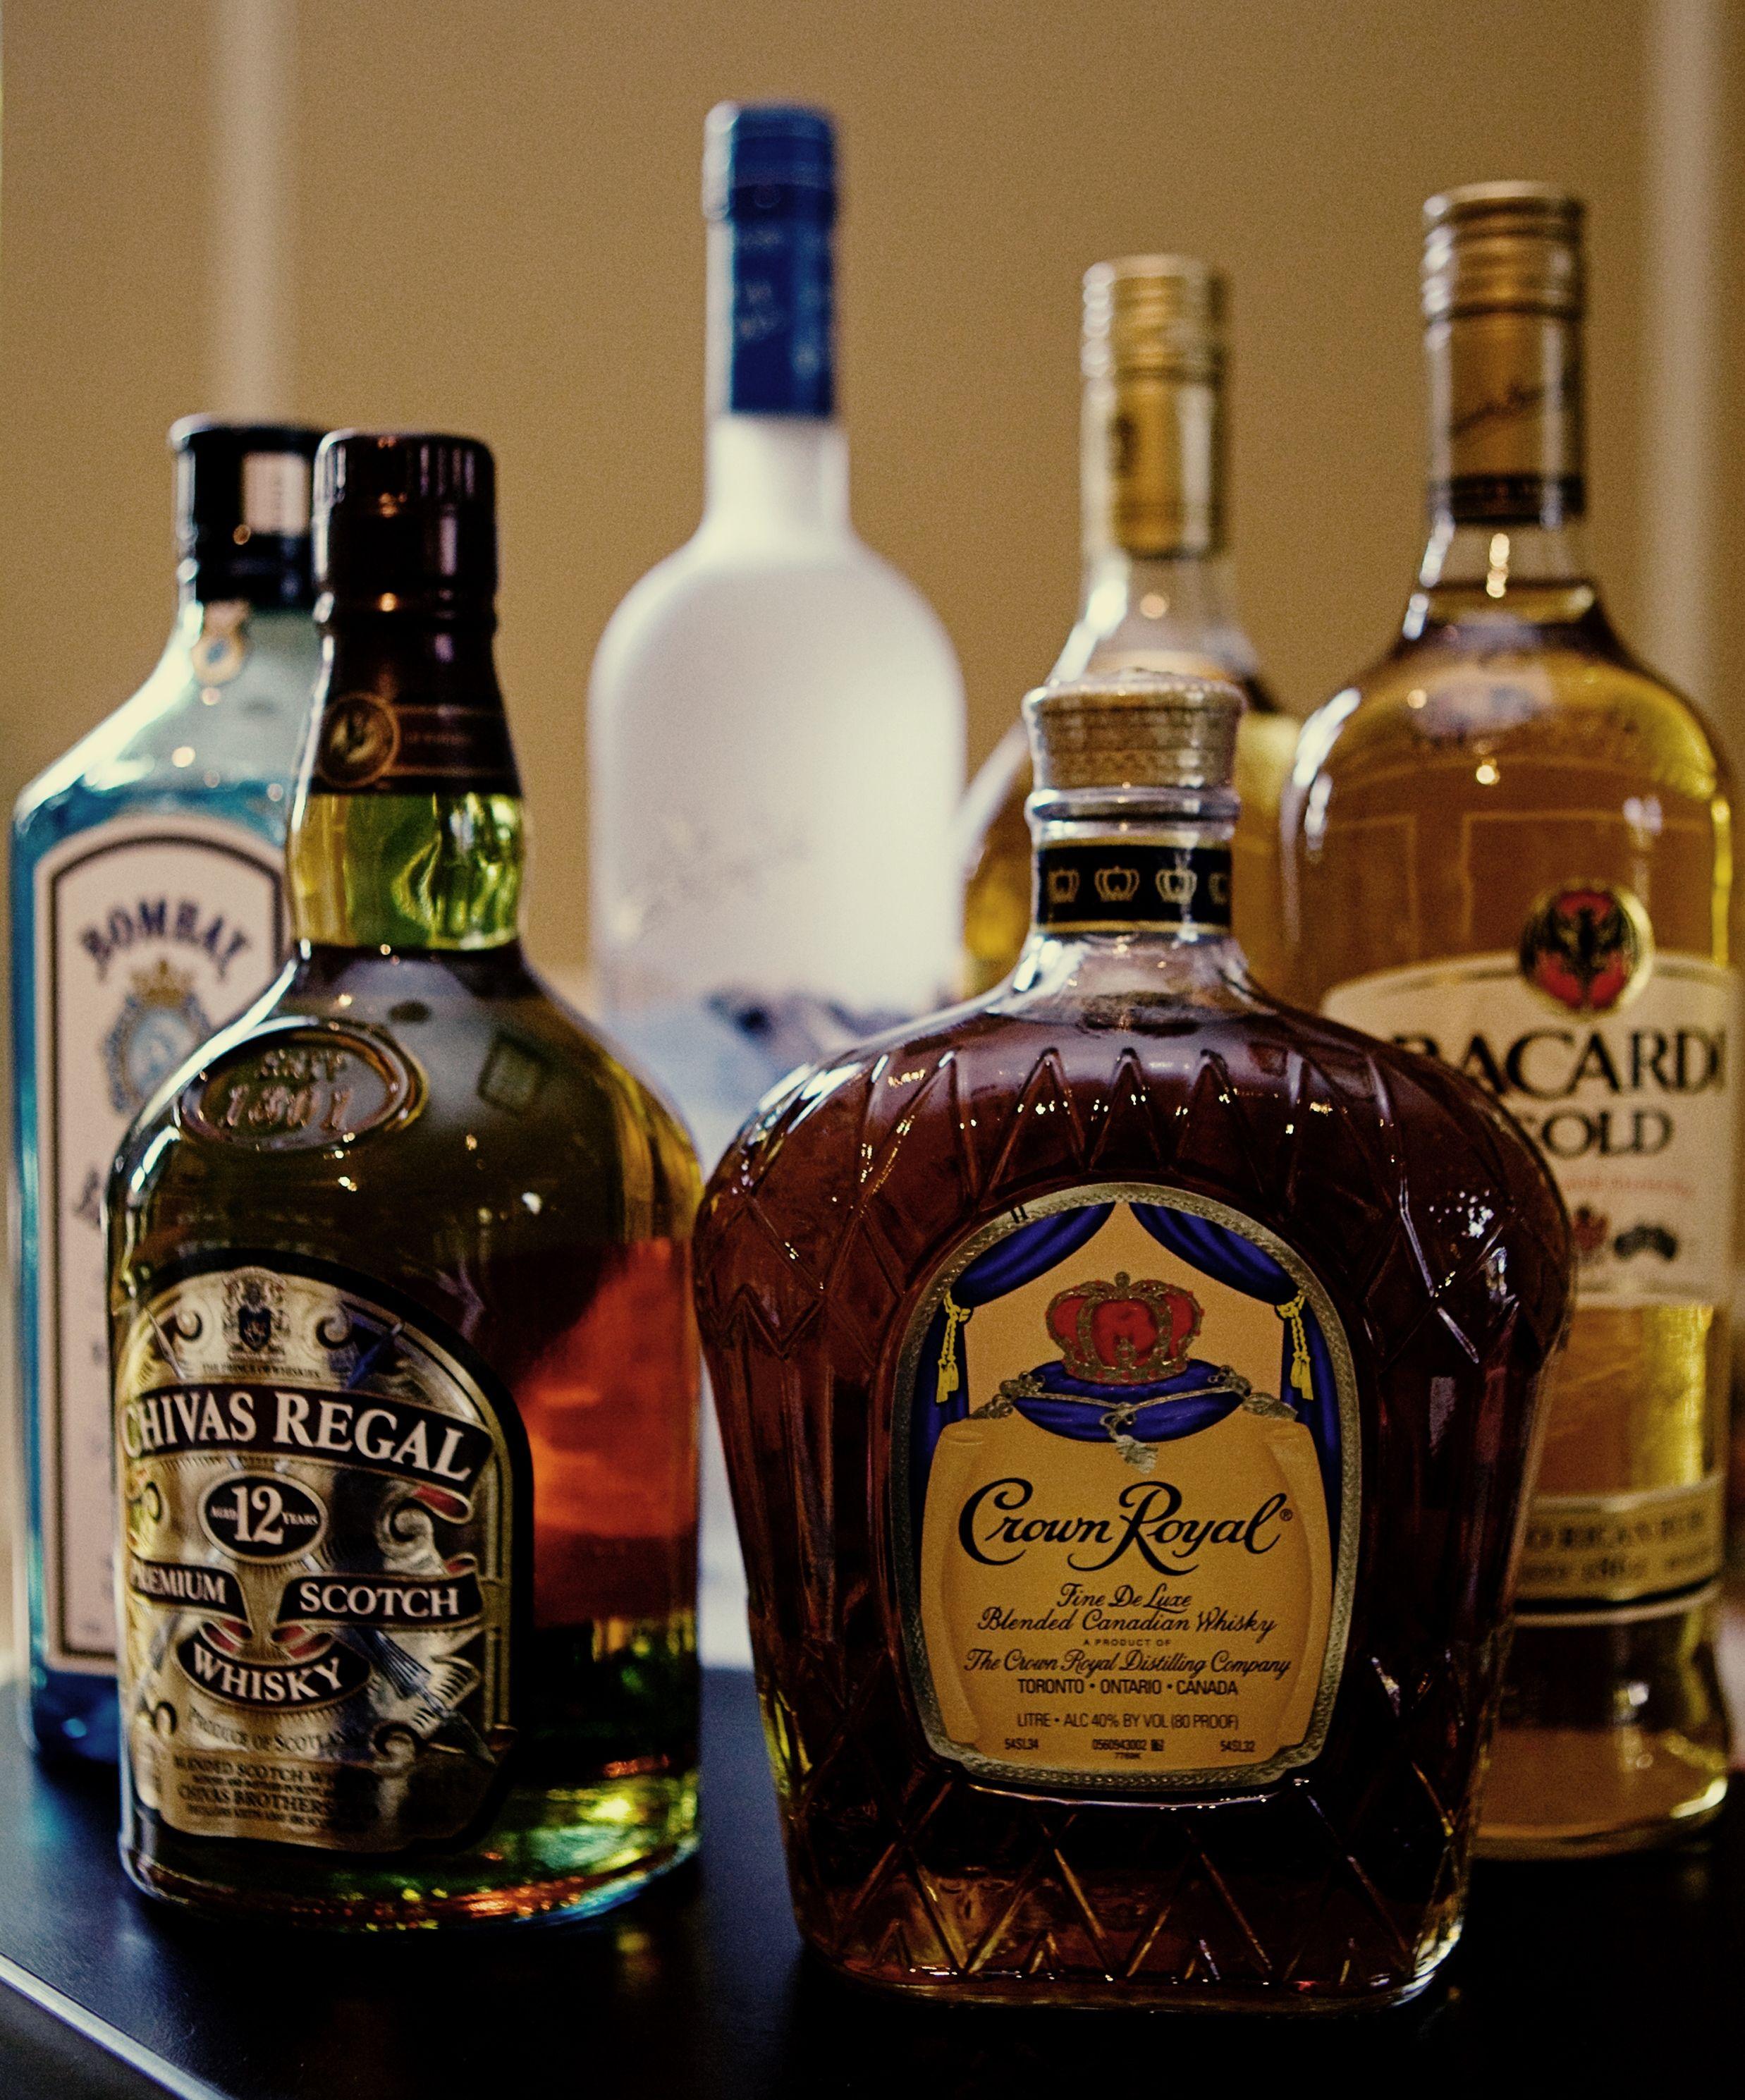 Top Shelf Liquor Photo by One Tree Photography Liquor